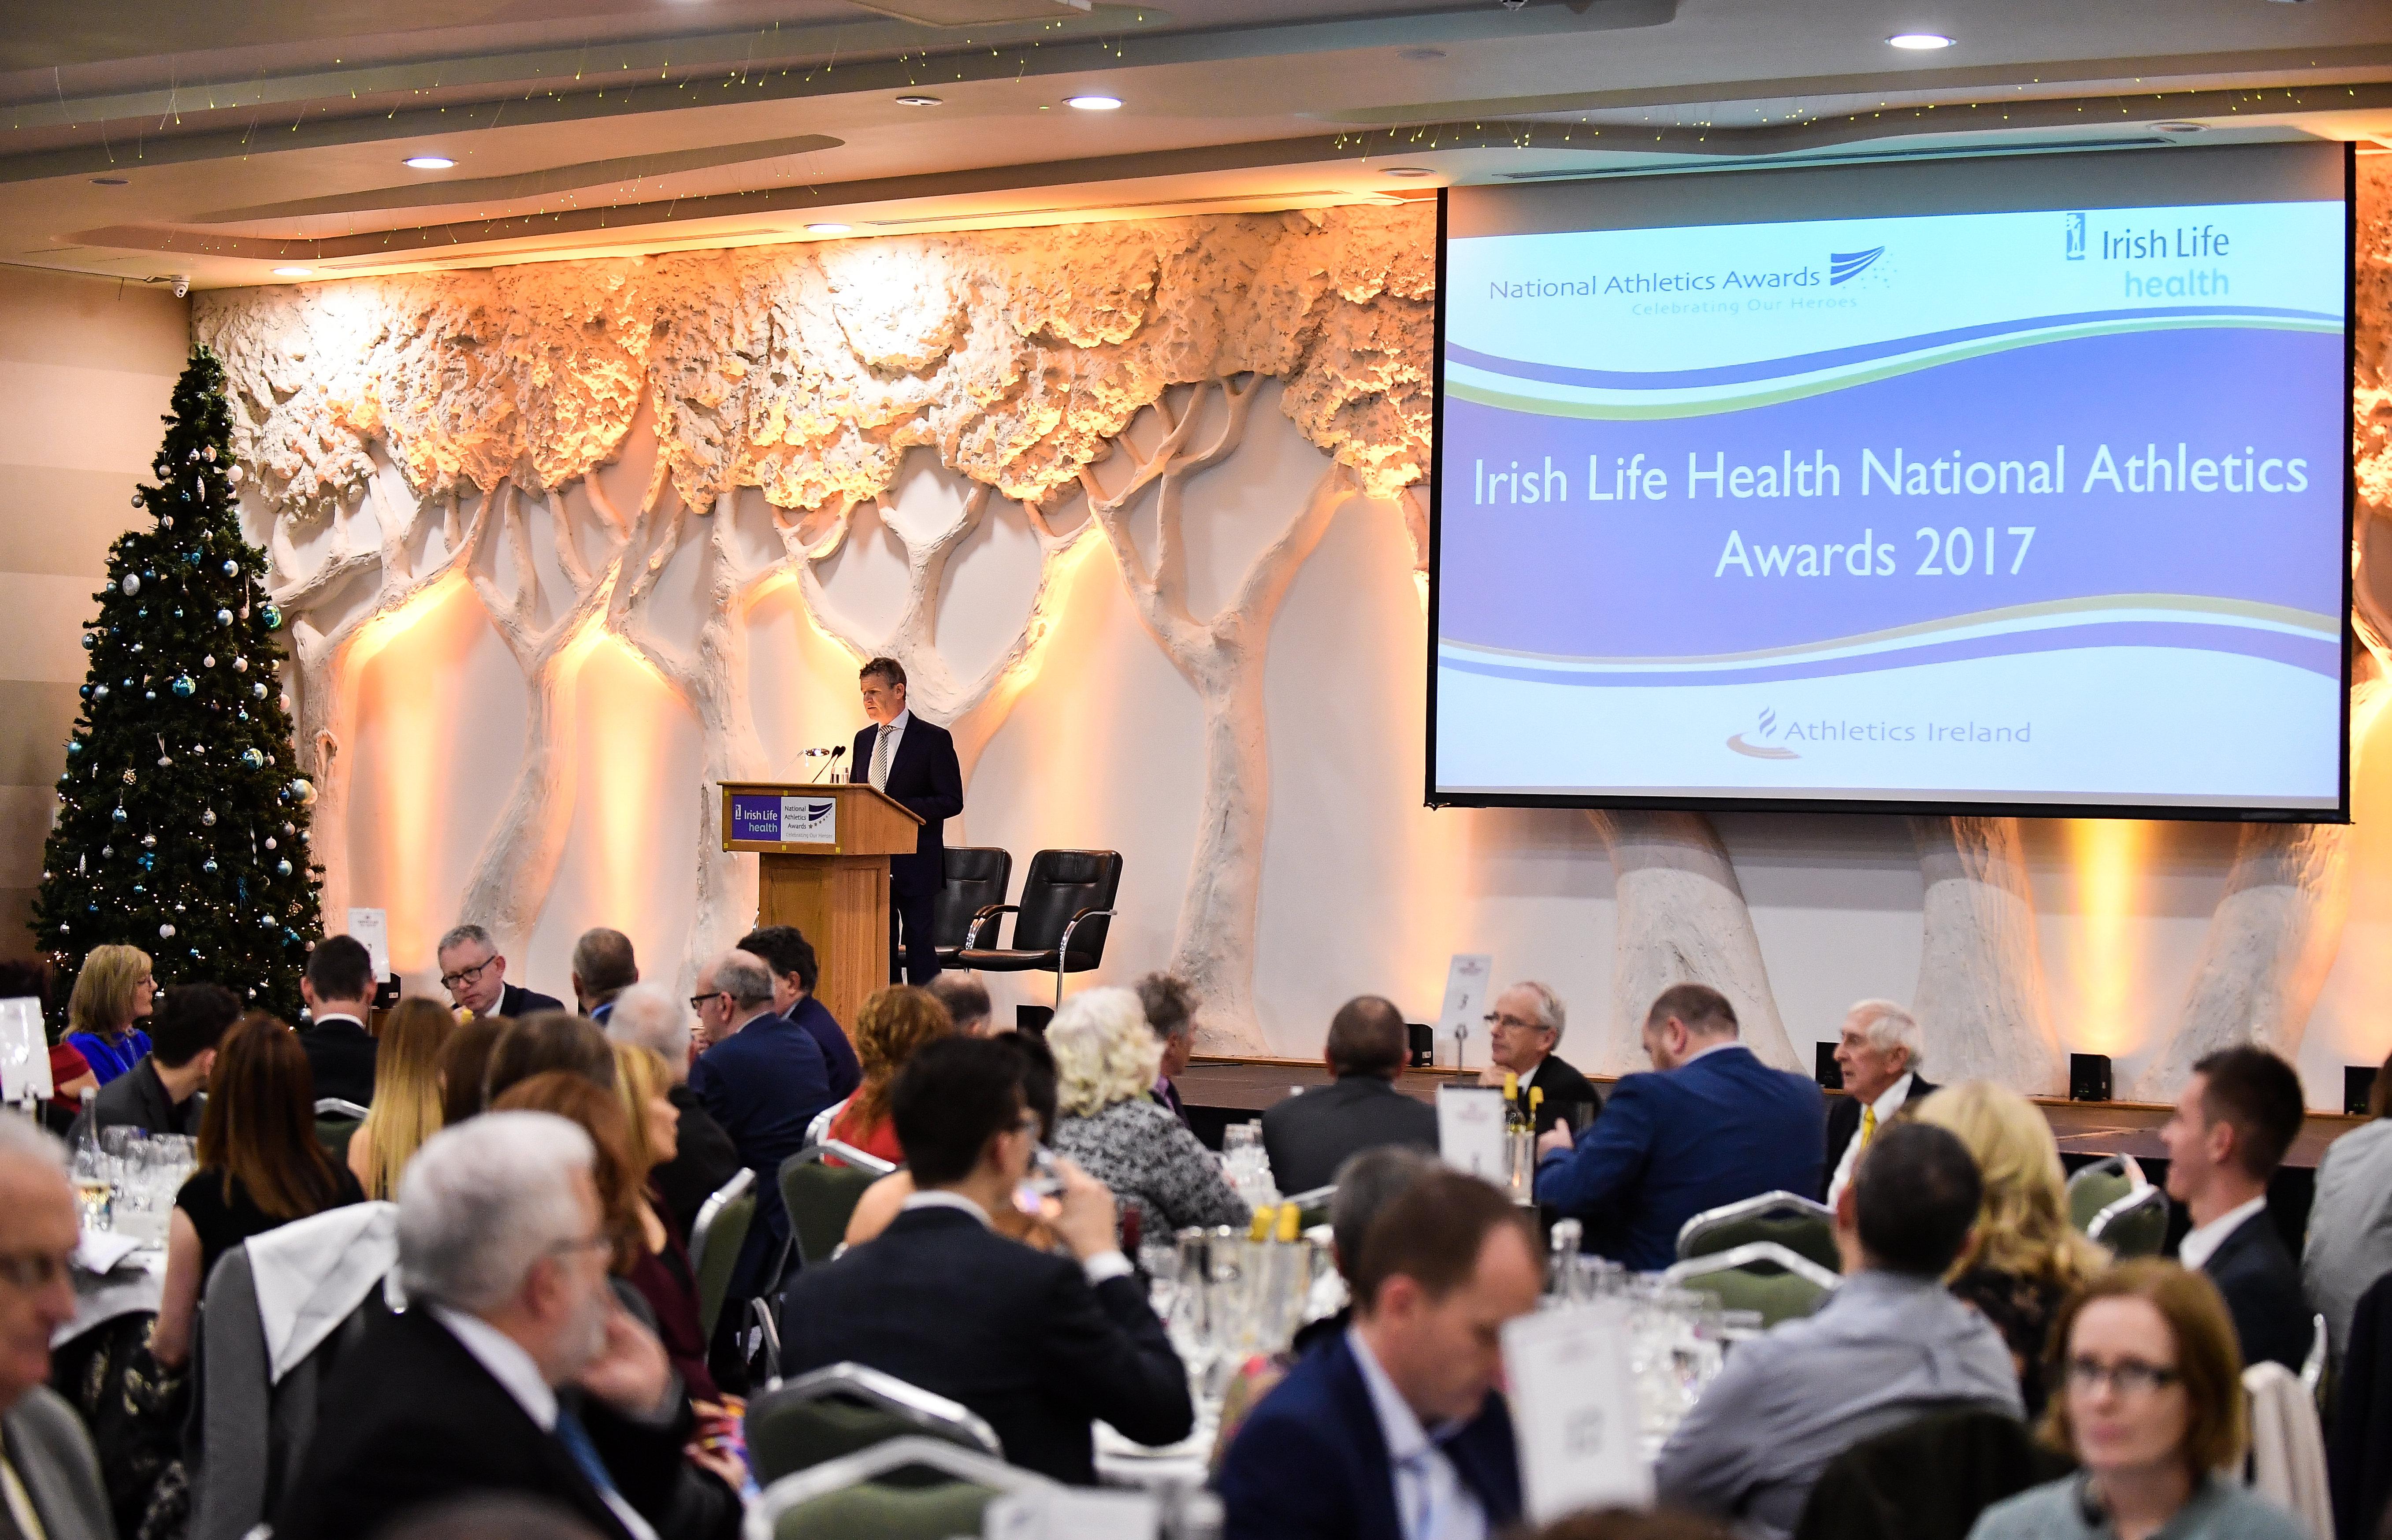 The Irish Life Health National Athletic Awards 2018